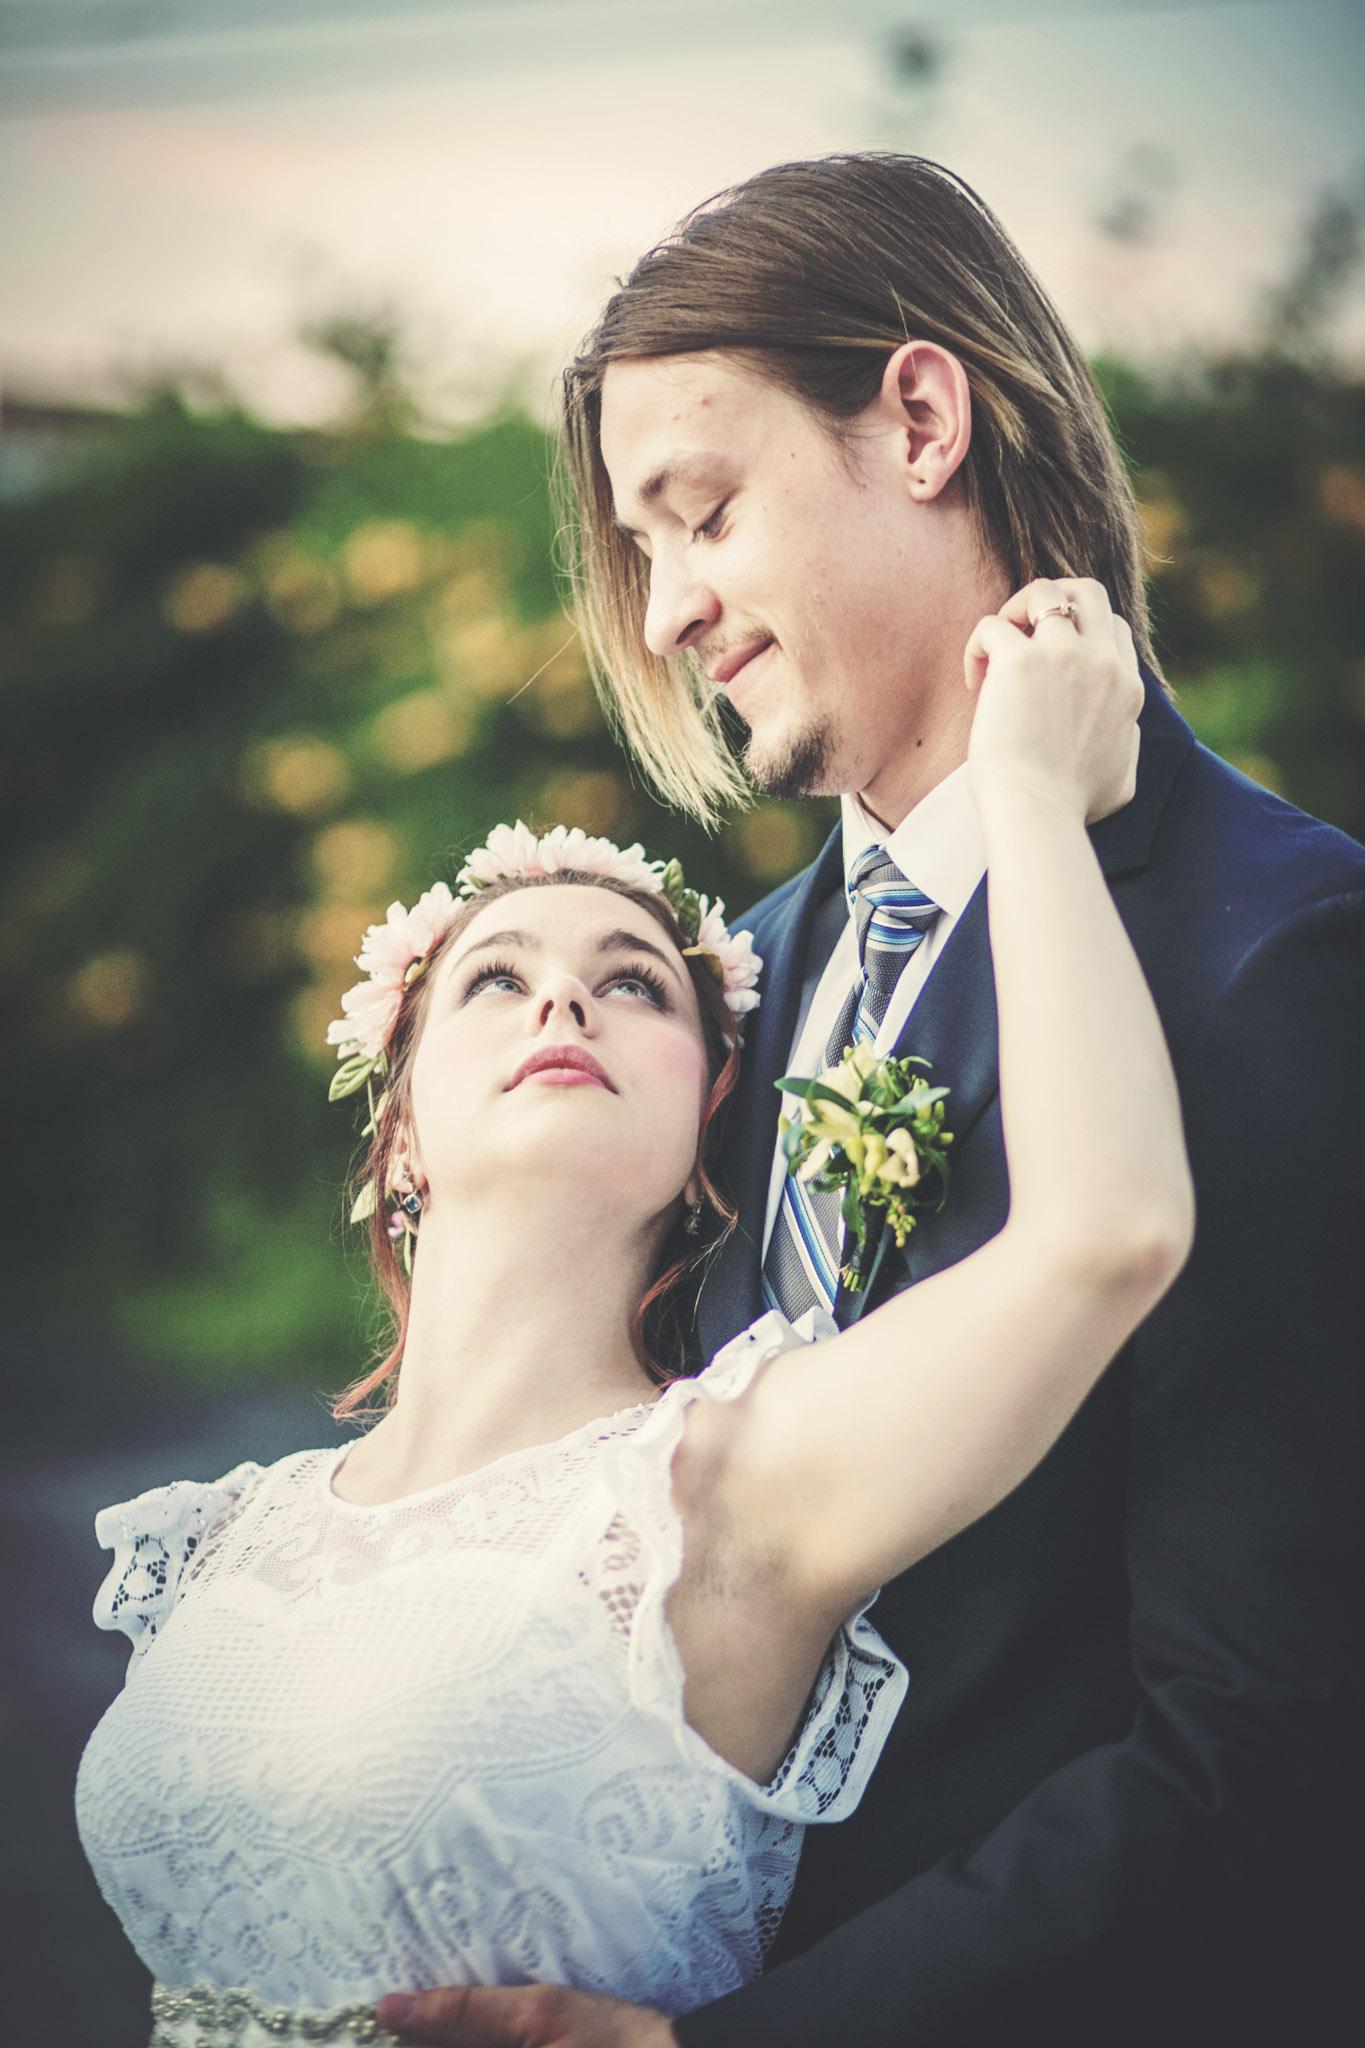 Kansas_City_Small_Wedding_Venue_Elope_Intimate_Ceremony_Budget_Affordable_Sophie&Philip_275b.jpg